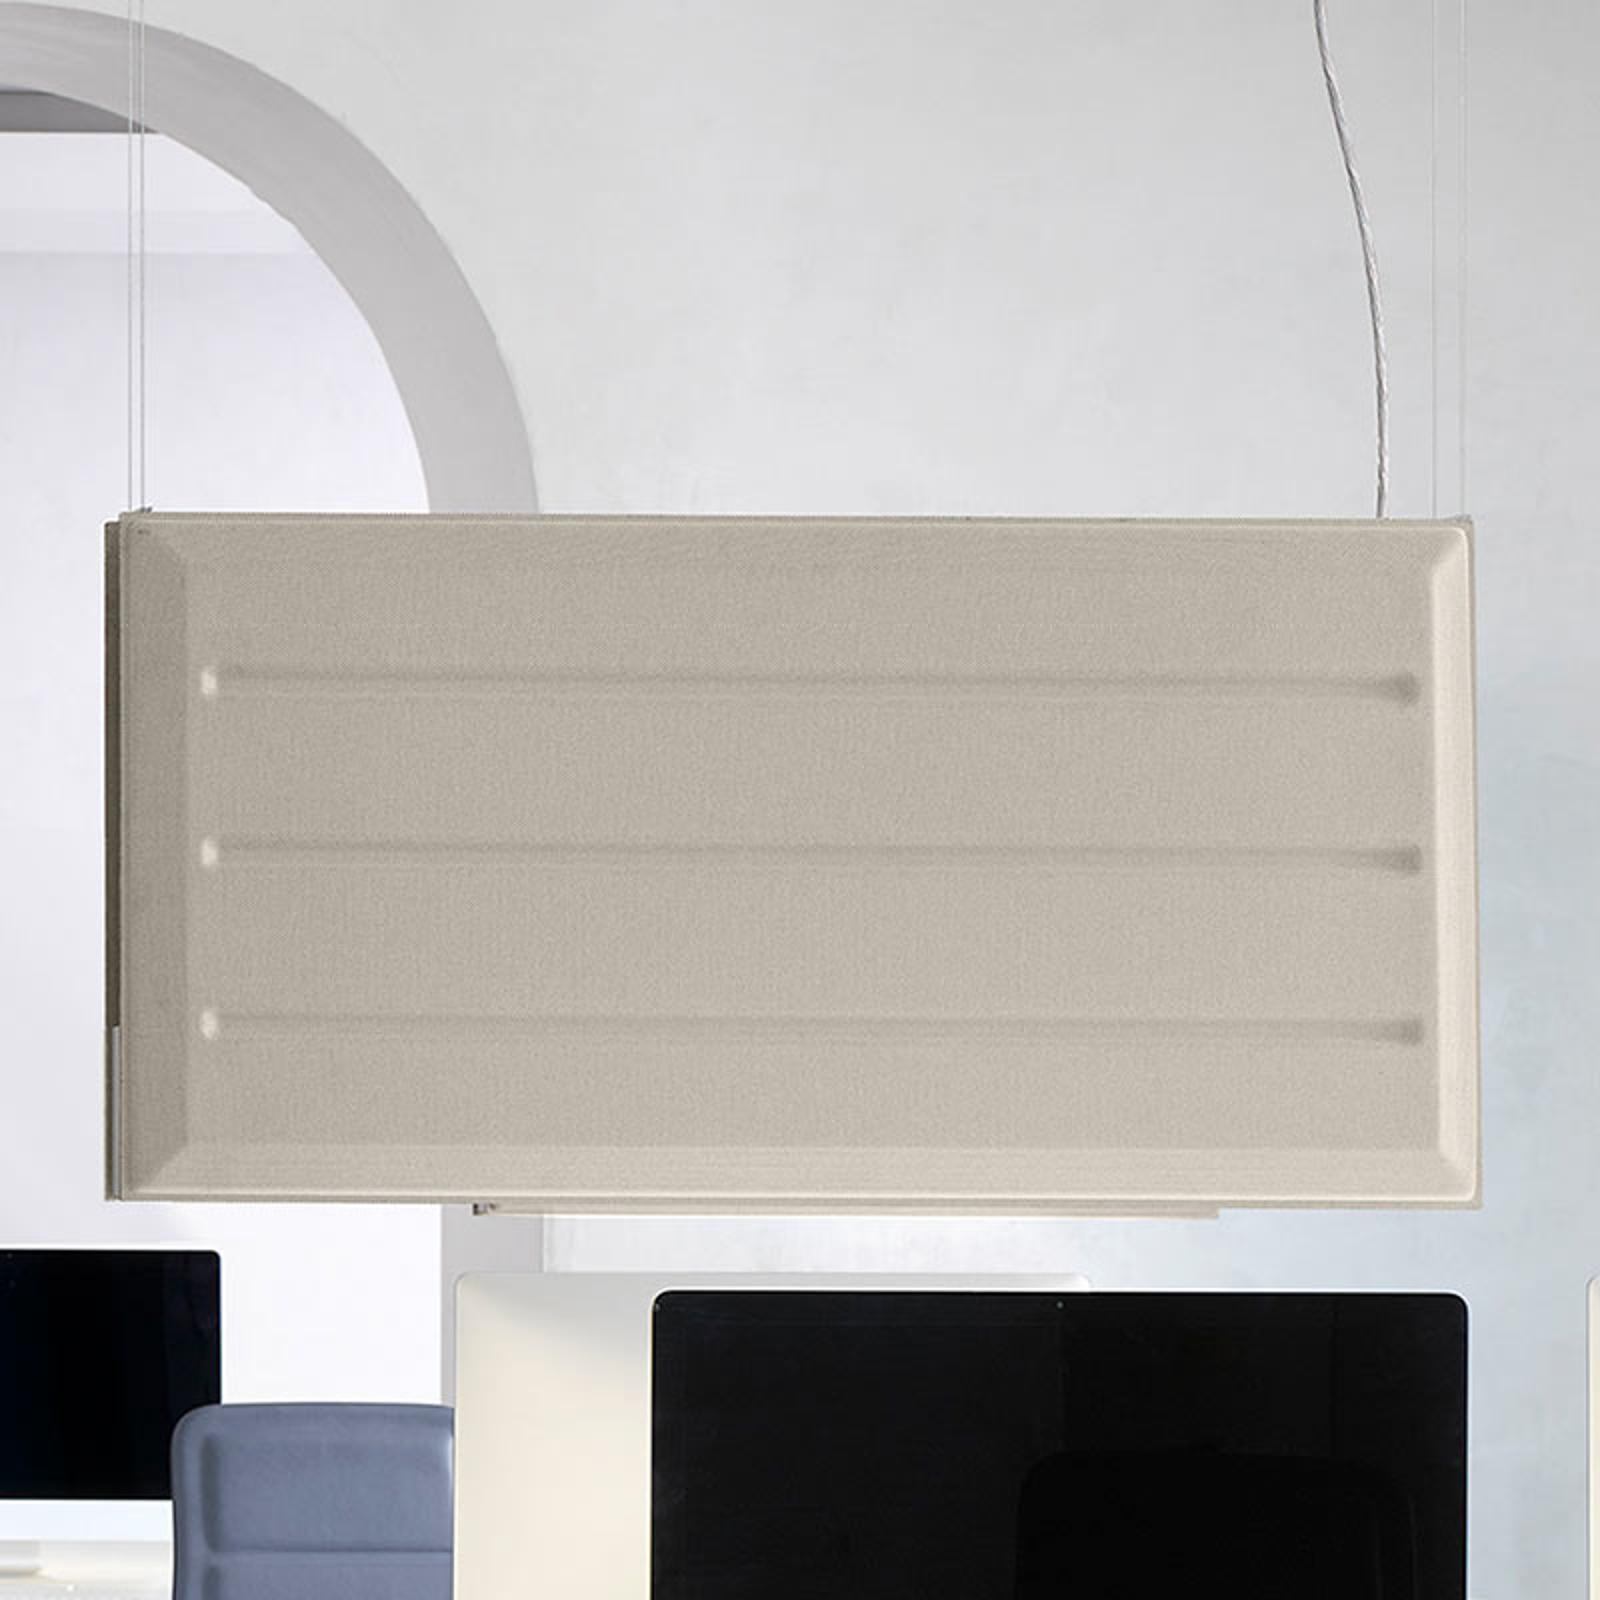 Luceplan Diade LED-riippuvalo pysty beige 120 cm